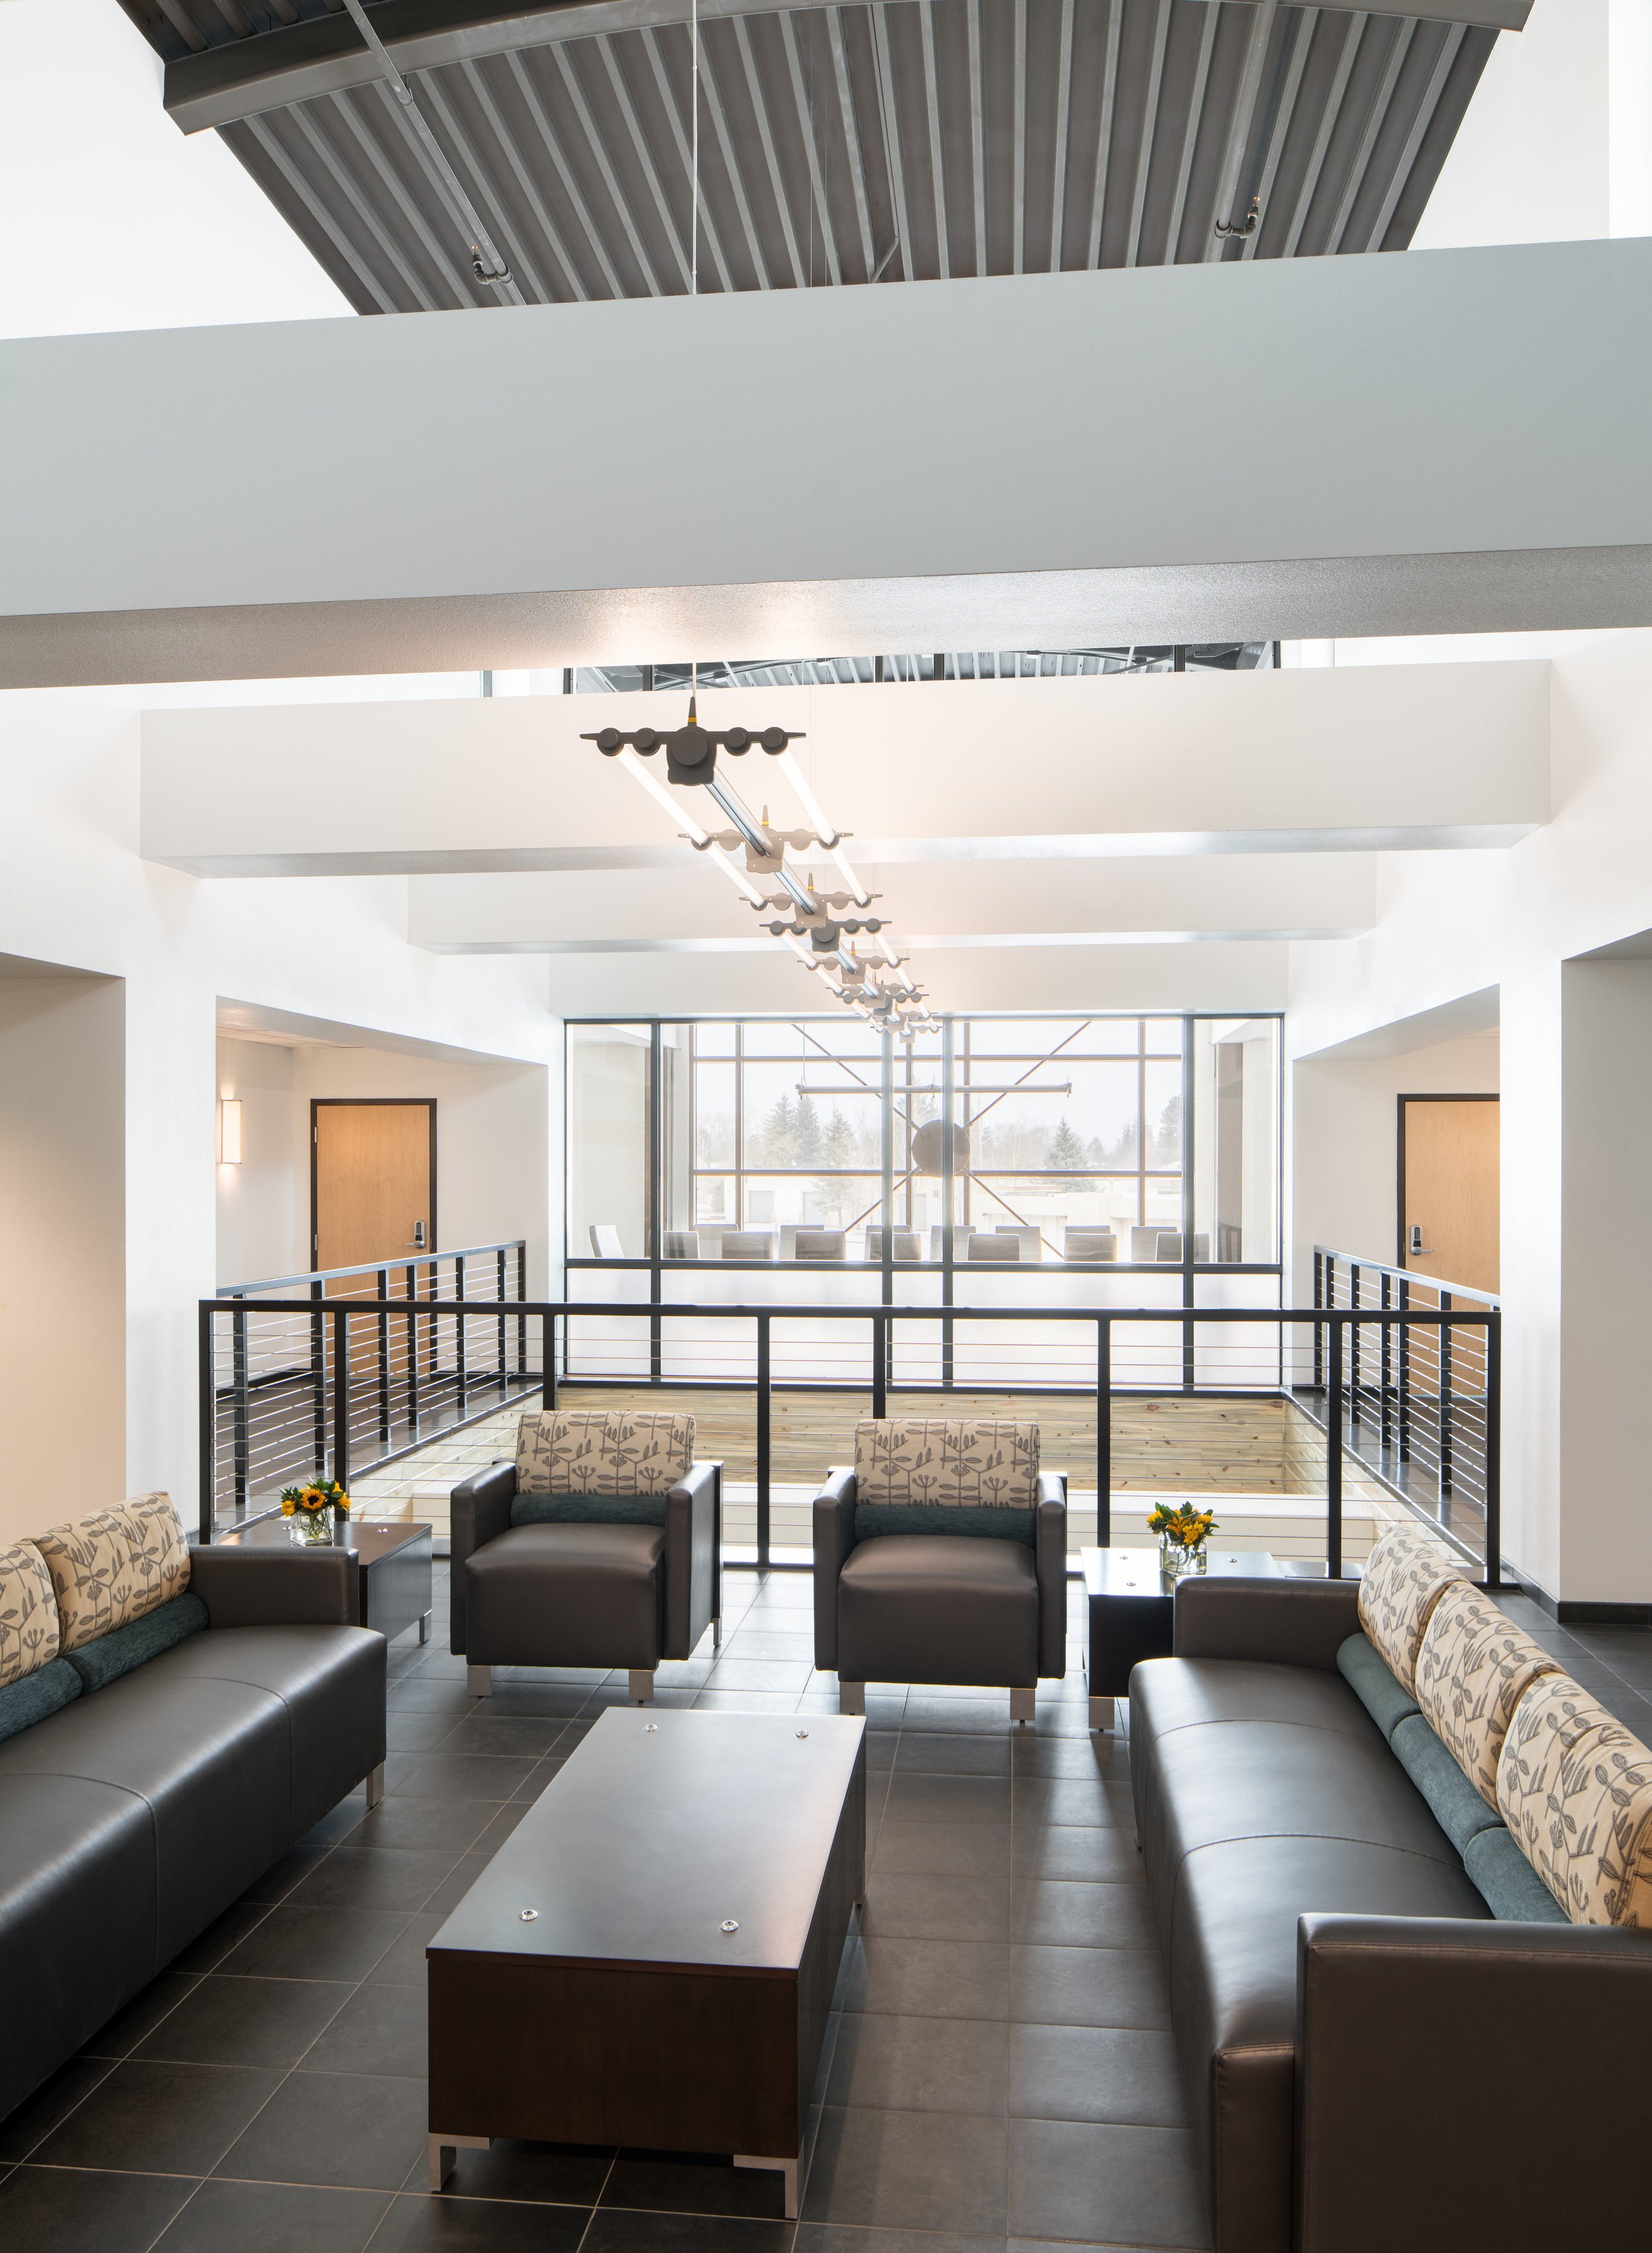 B16 Interior, Lobby, looking toward conference room.jpg